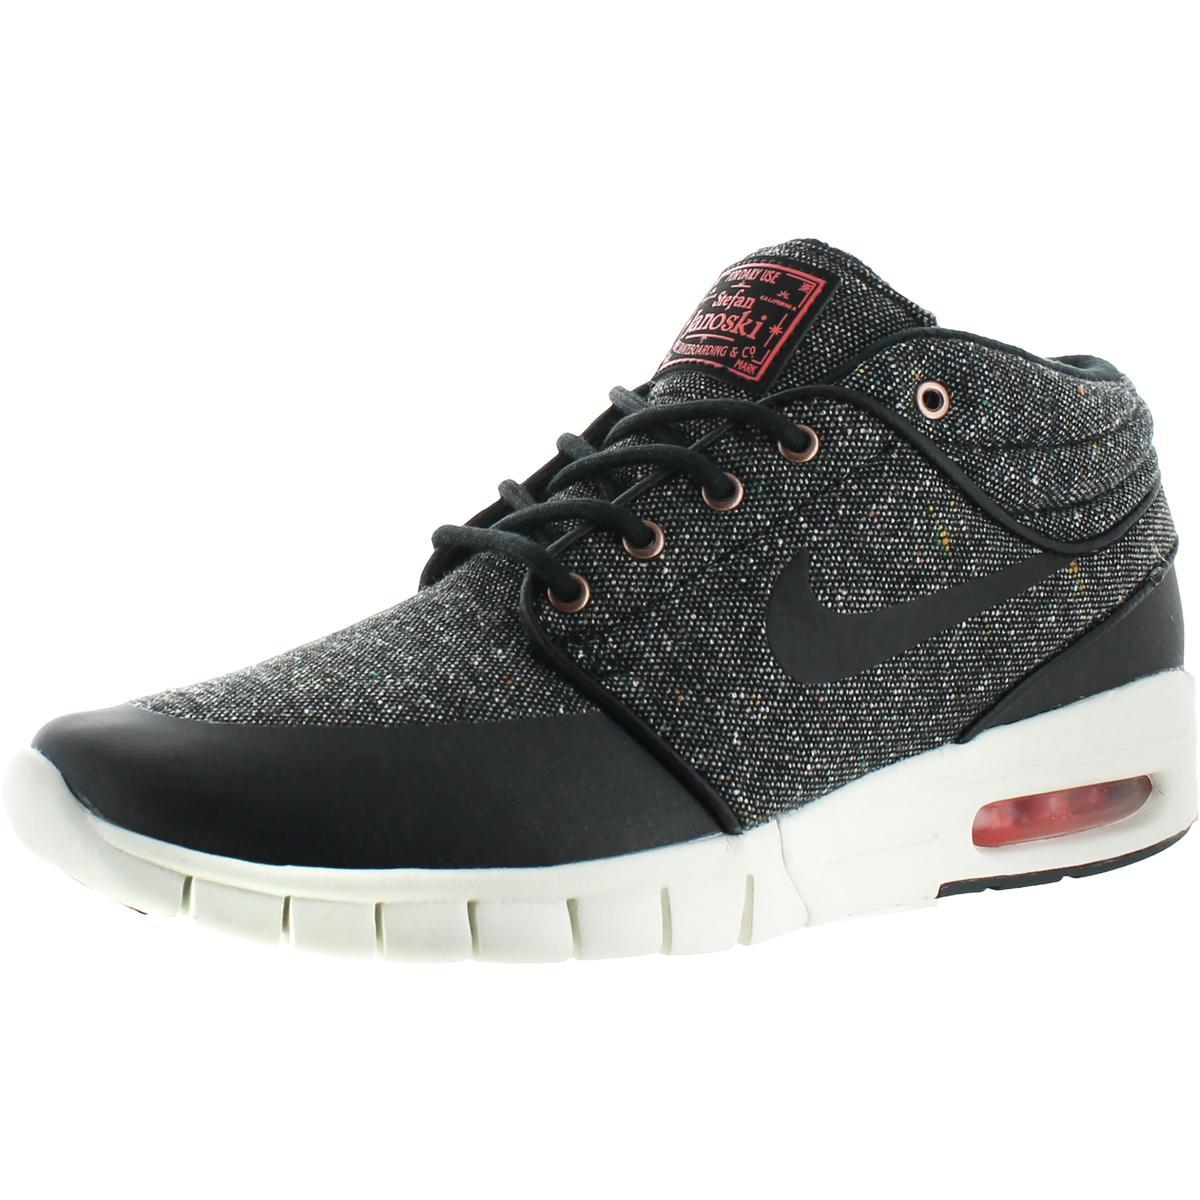 d274b1472c0 Details about Nike Mens Stefan Janoski Max Mid Black Skate Shoes 6.5 Medium  (B